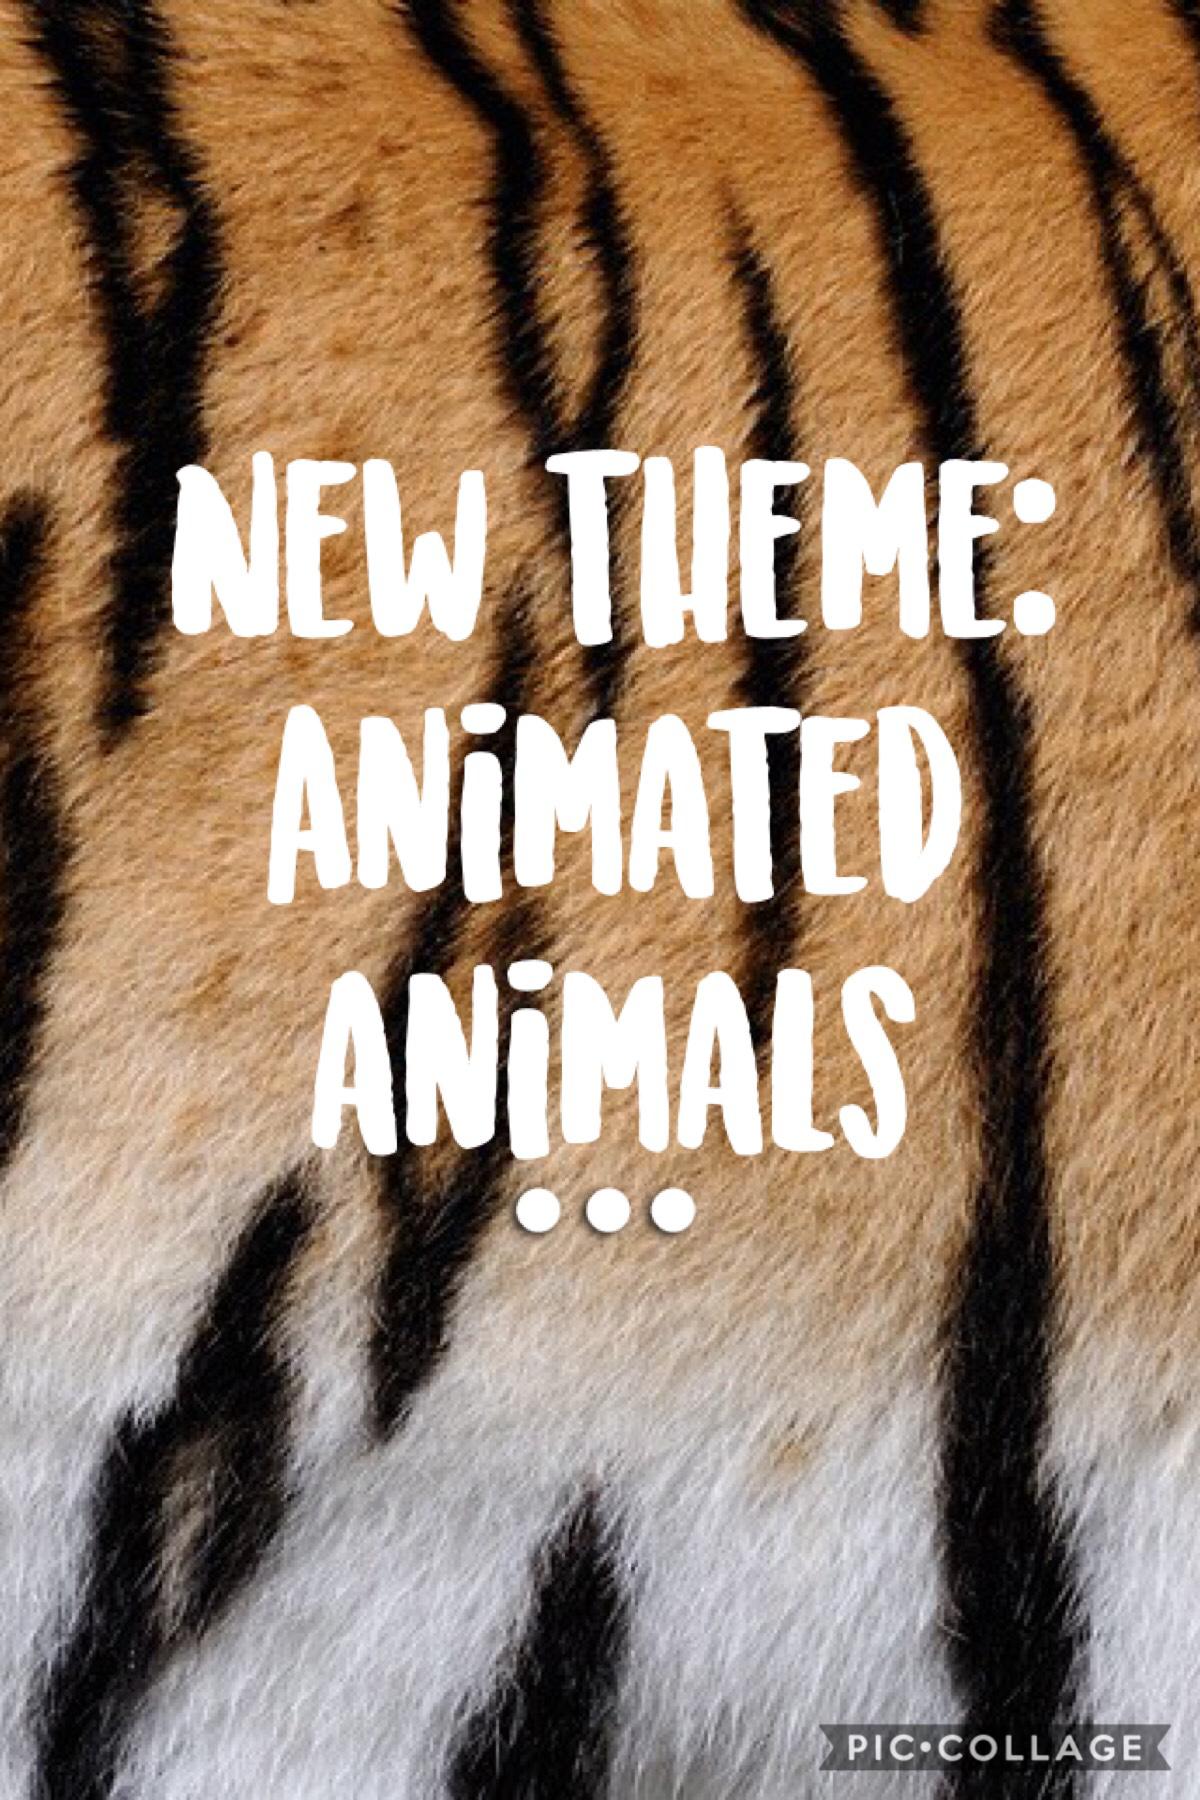 Animated animals!!!